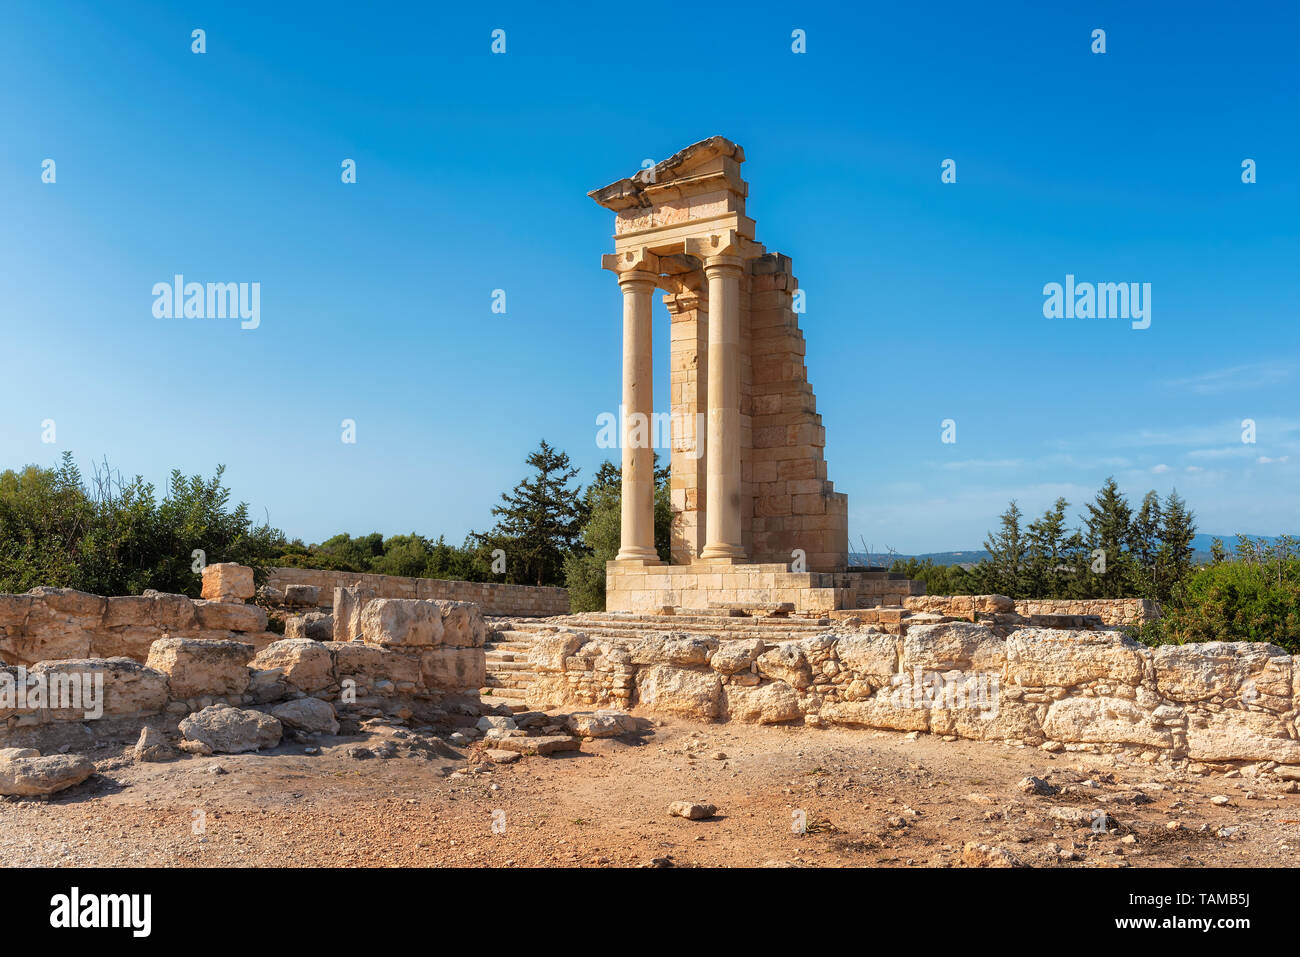 Apollo Hylates - main religious centres of ancient Limassol, Cyprus - Stock Image